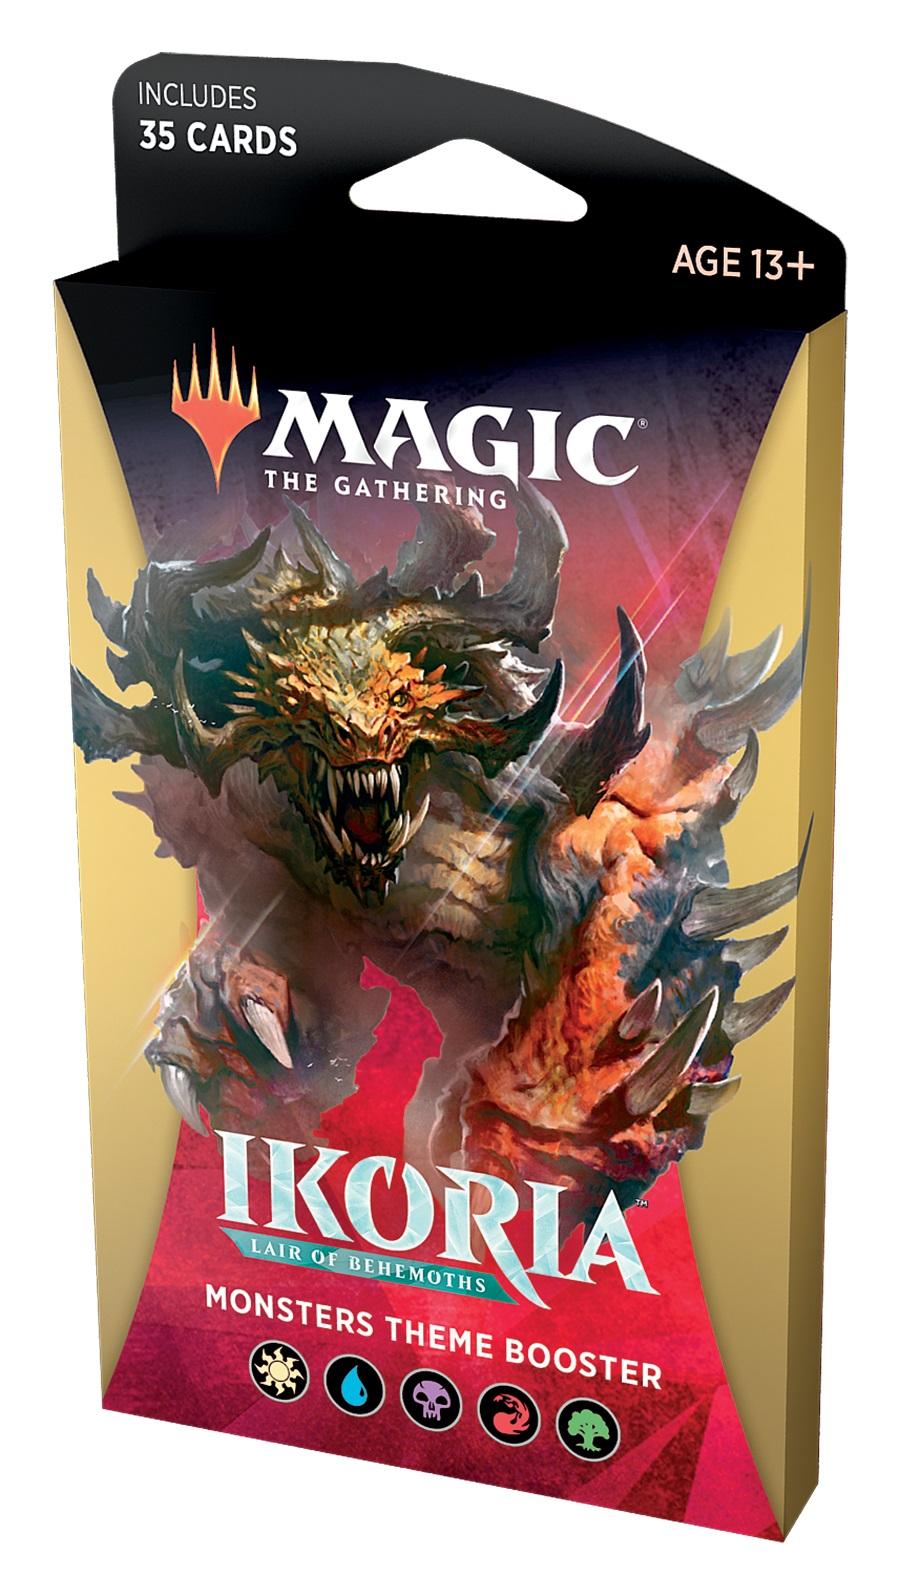 Ikoria: Lair of Behemoths Theme Booster - Monster